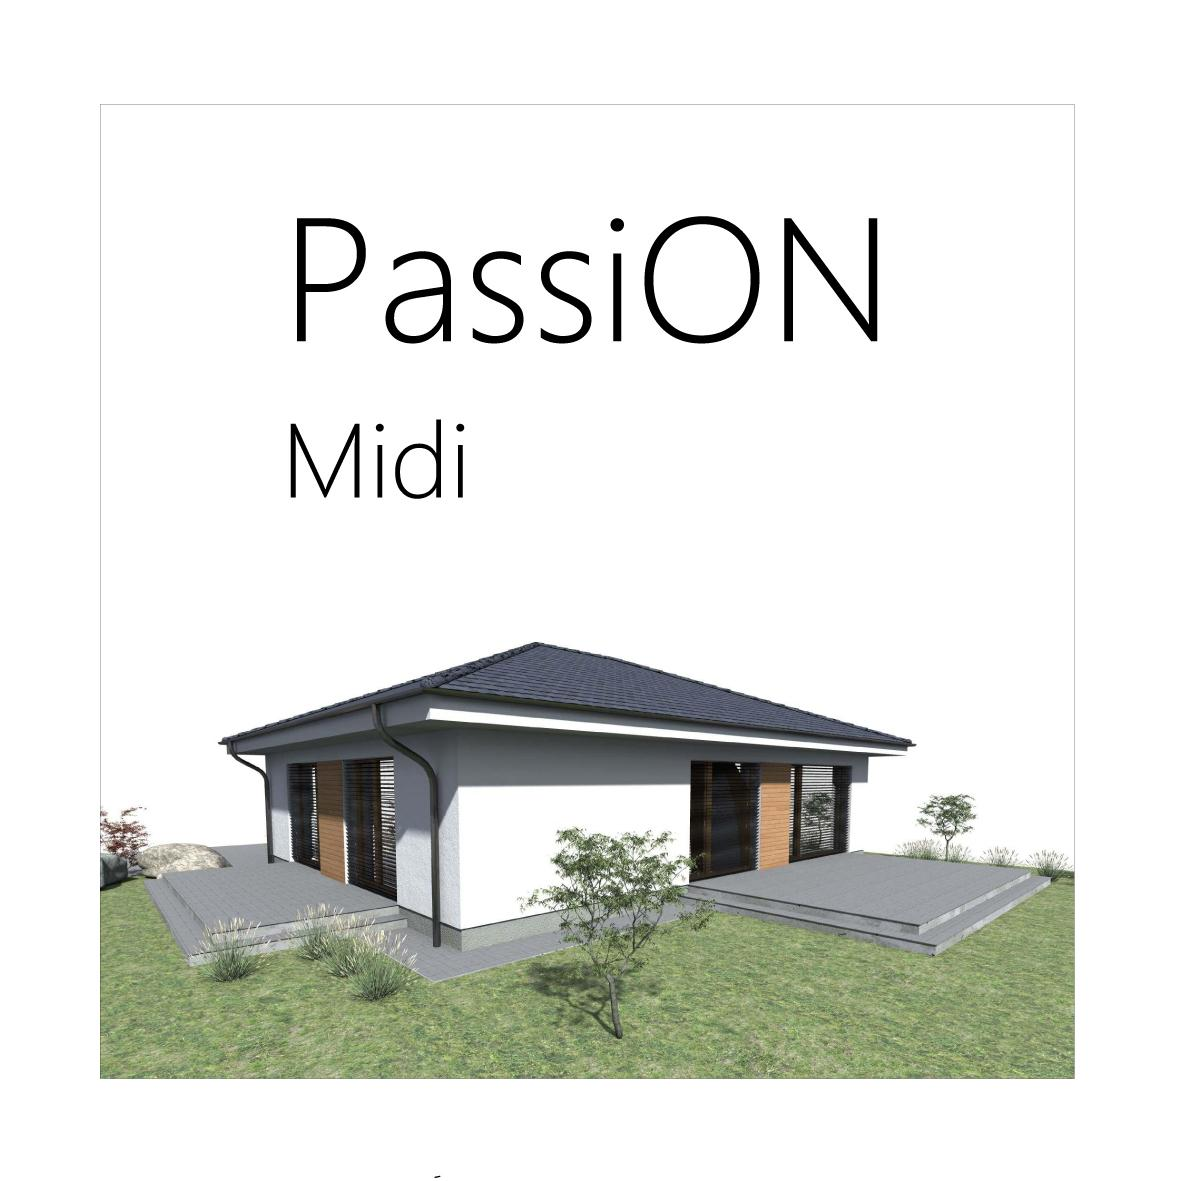 Projekt pasívneho domu - PassiON Midi - Obrázok č. 1